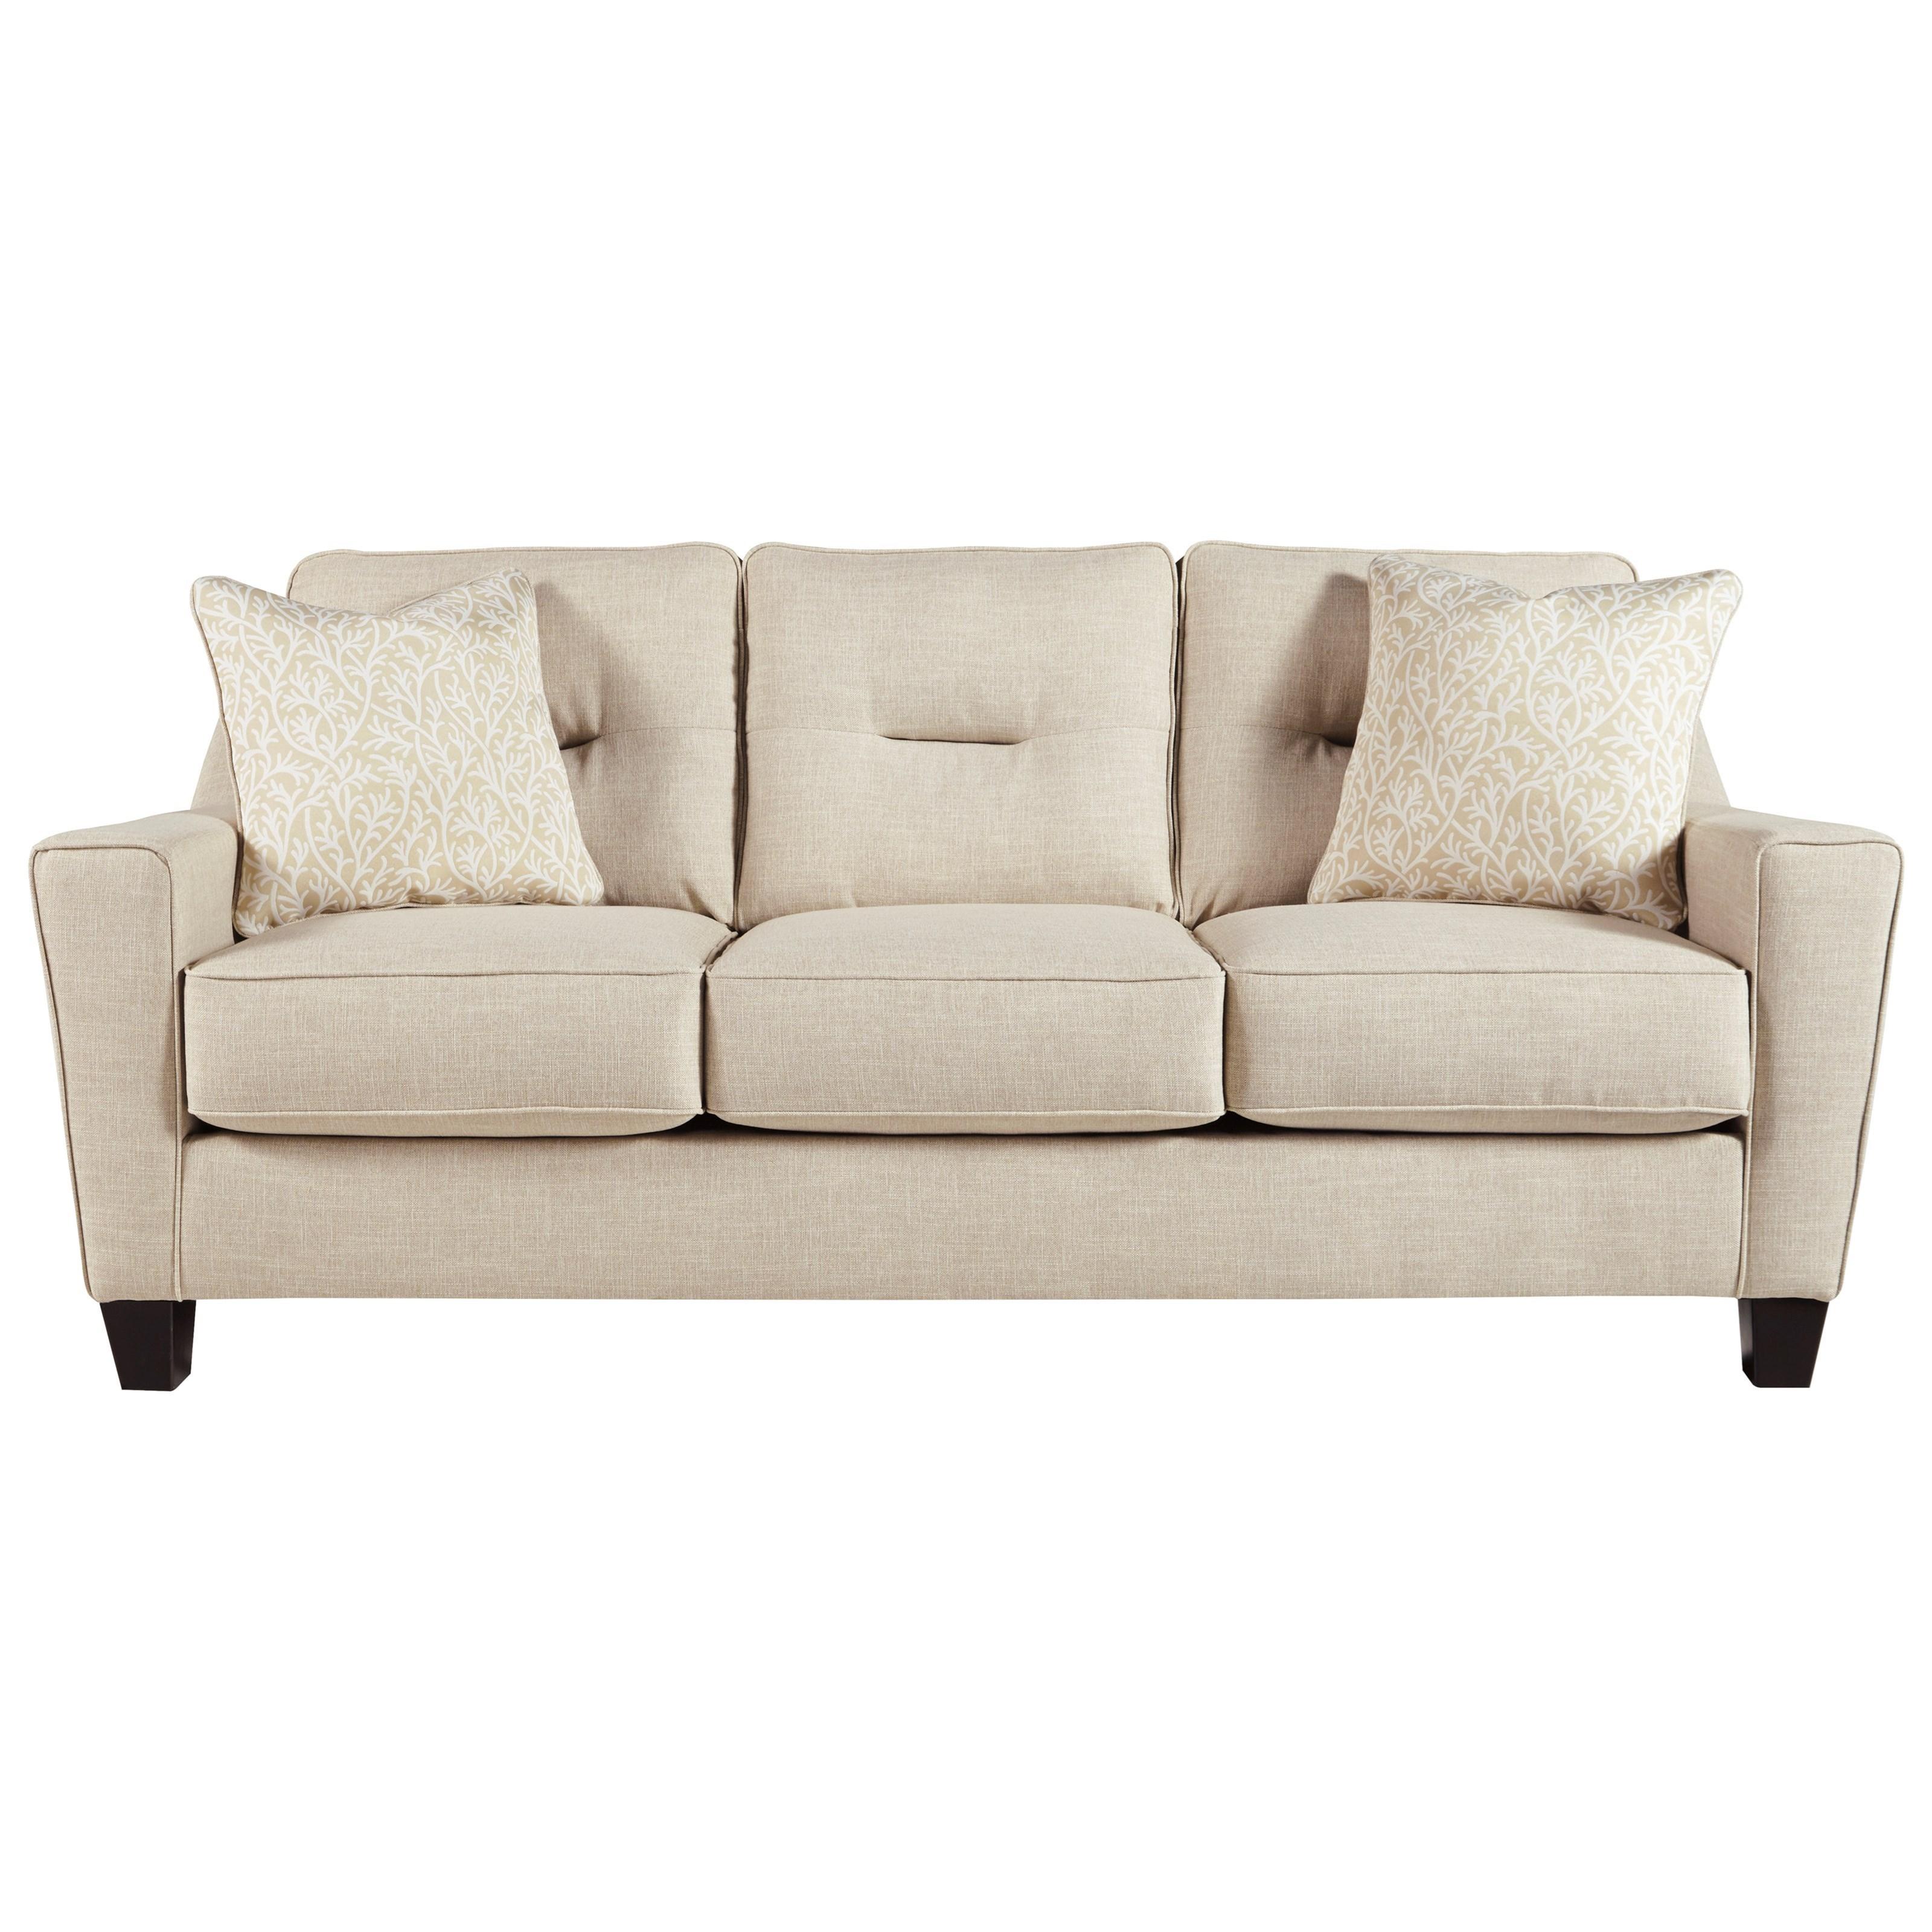 Benchcraft Forsan Nuvella Sofa - Item Number: 6690538